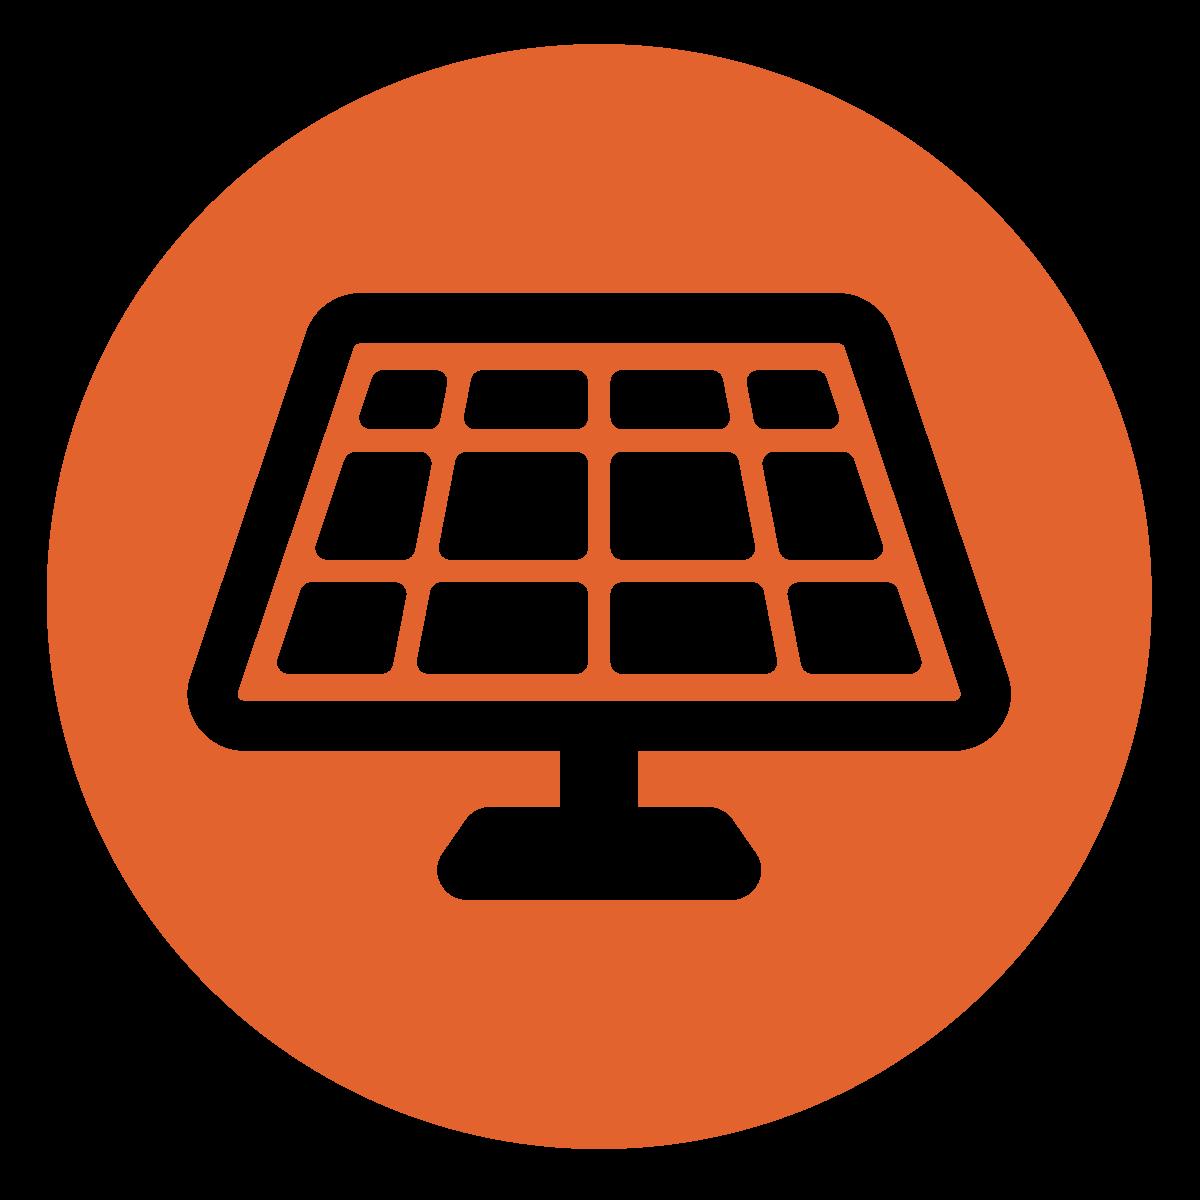 white solar panel in dark orange circle